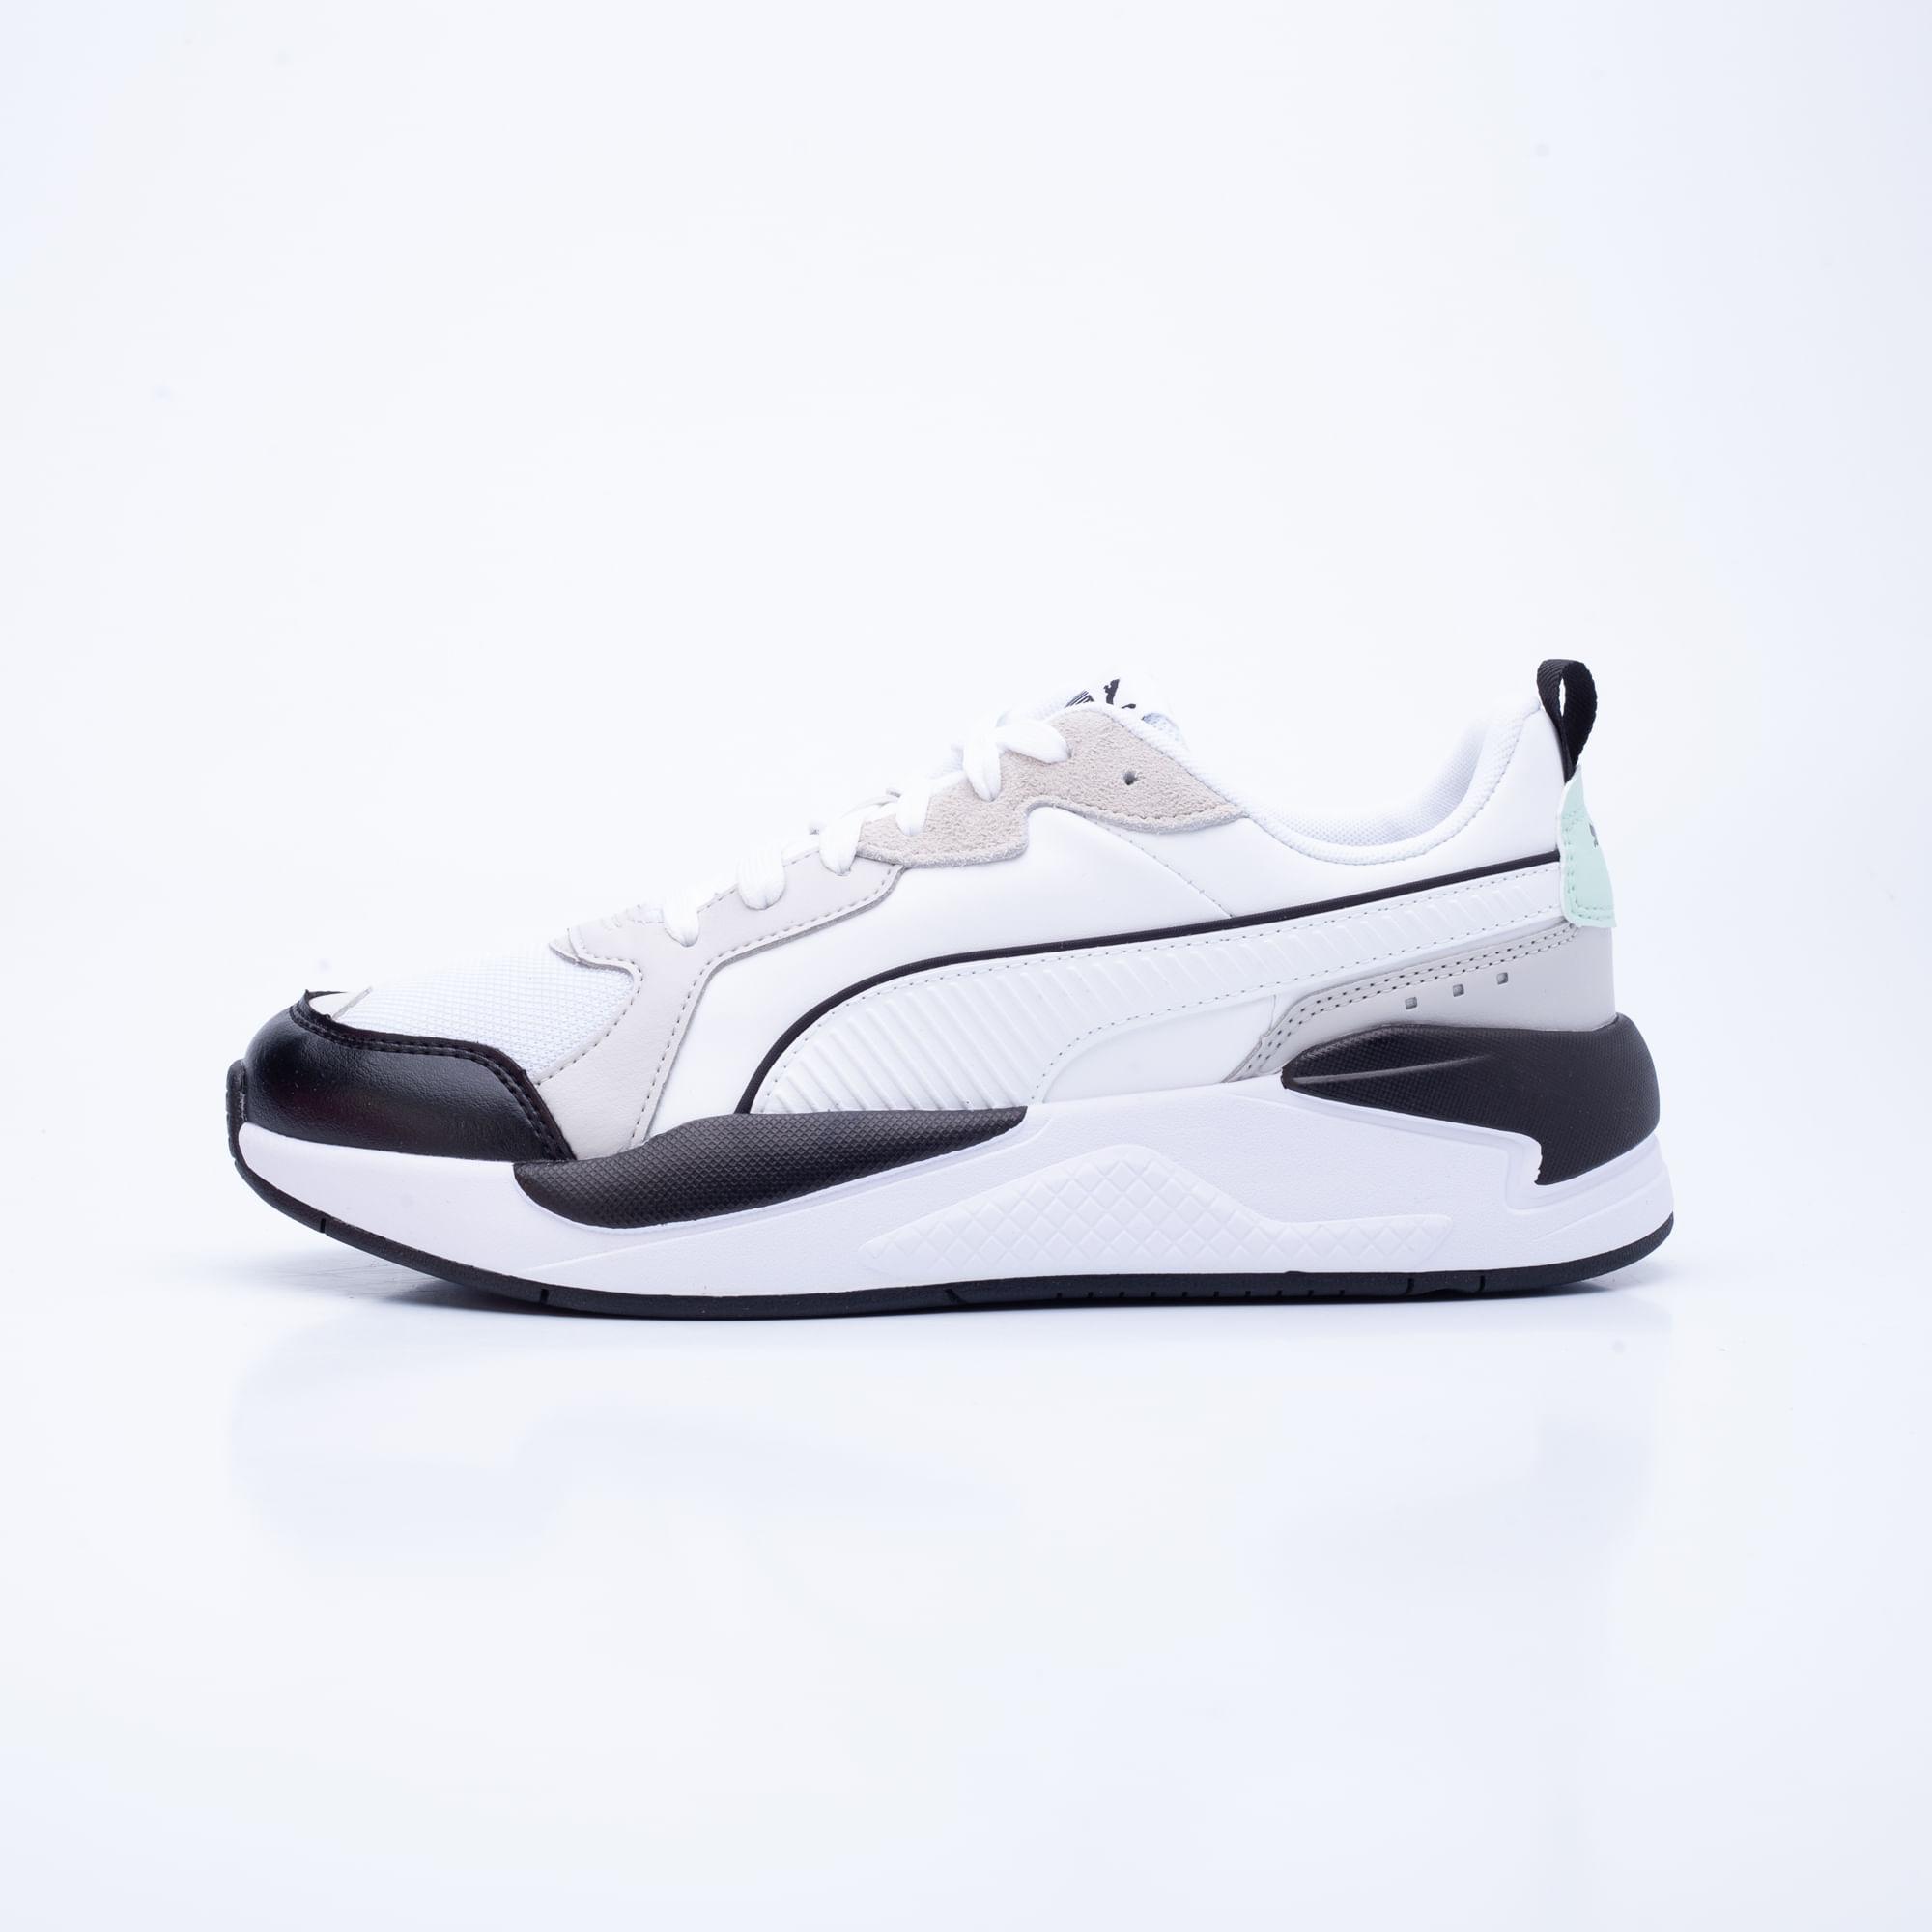 Tenis-Puma-Hombre-372849-02-X-RAY-GAME